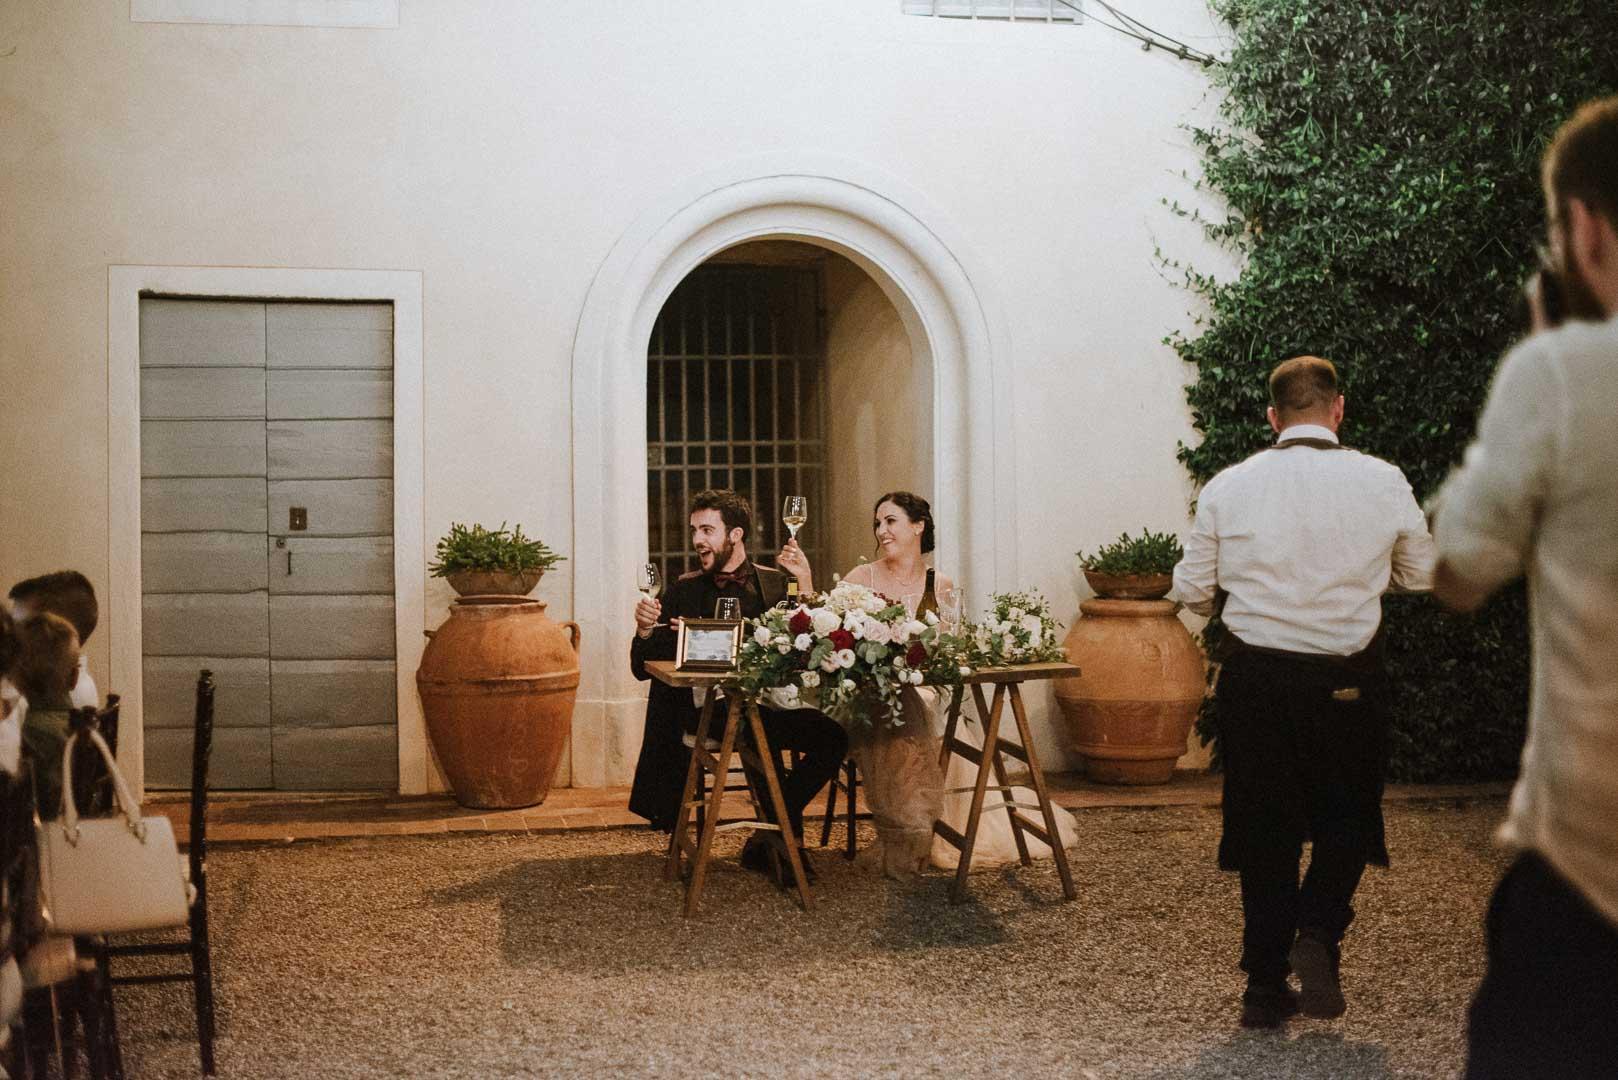 wedding-photographer-destination-fineart-bespoke-reportage-tuscany-villascorzi-vivianeizzo-spazio46-169